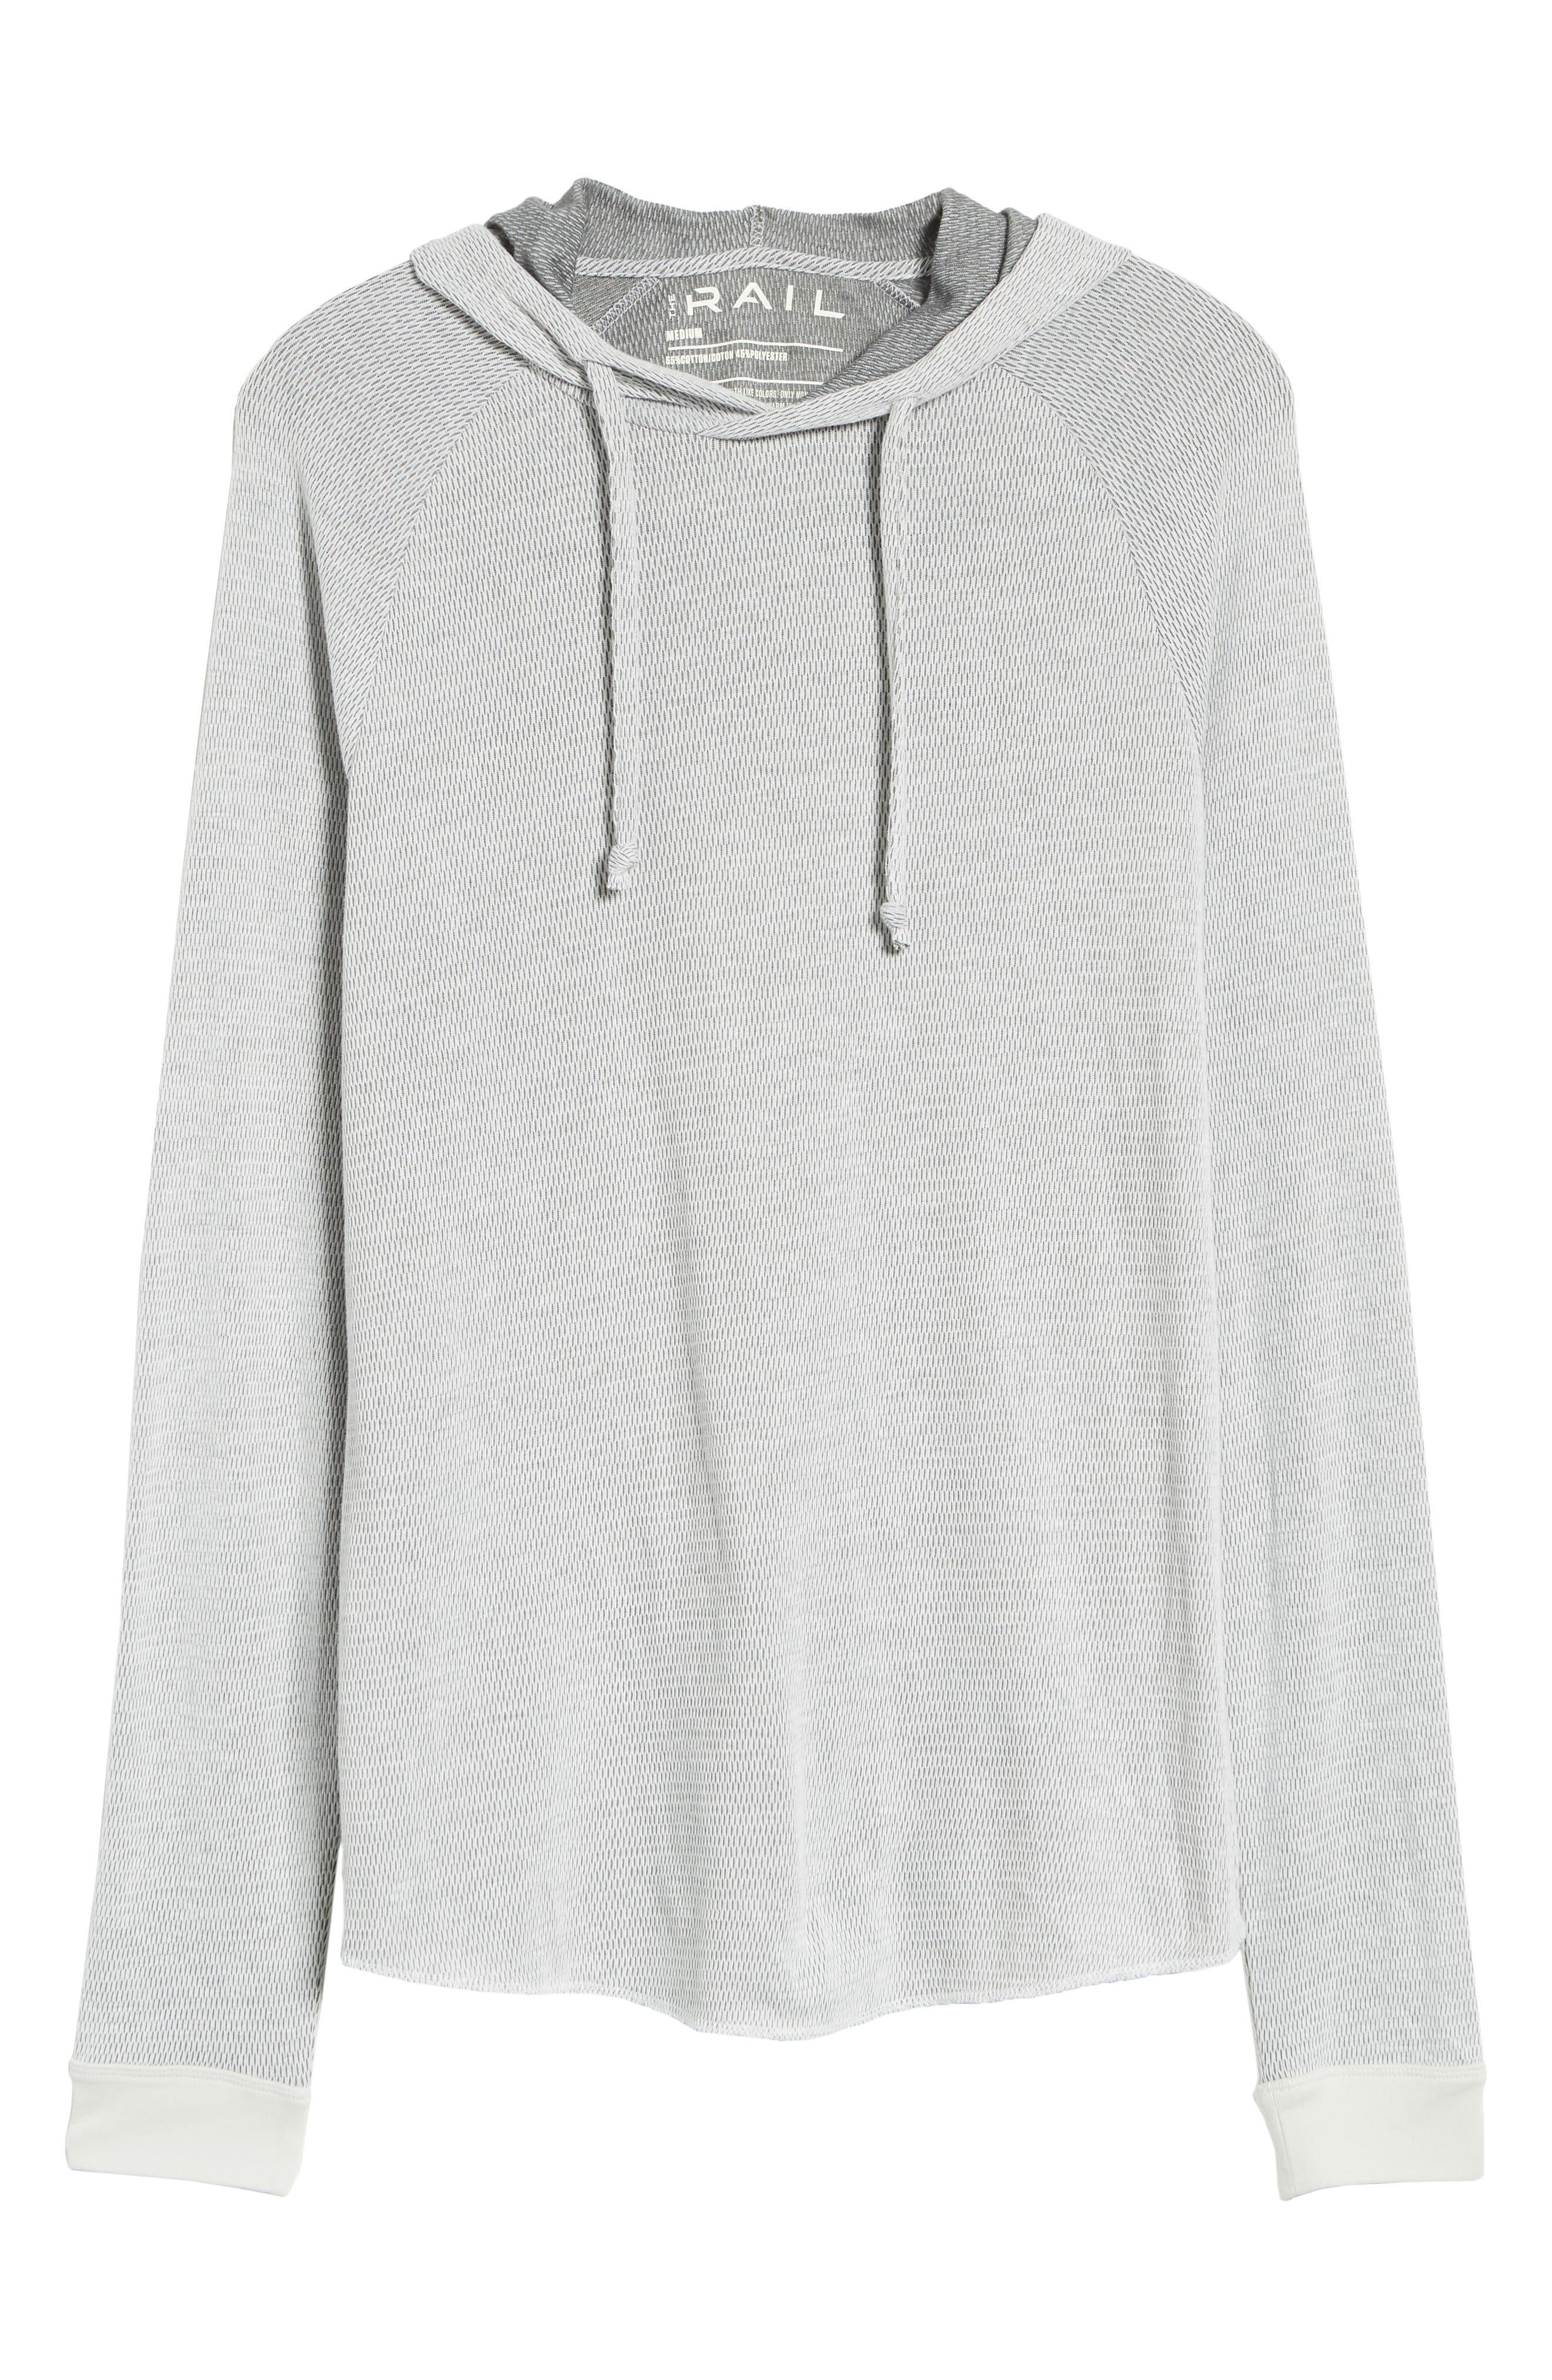 Thermal Knit Raglan Hoodie,                             Alternate thumbnail 6, color,                             GREY/ WHITE TWO TONE